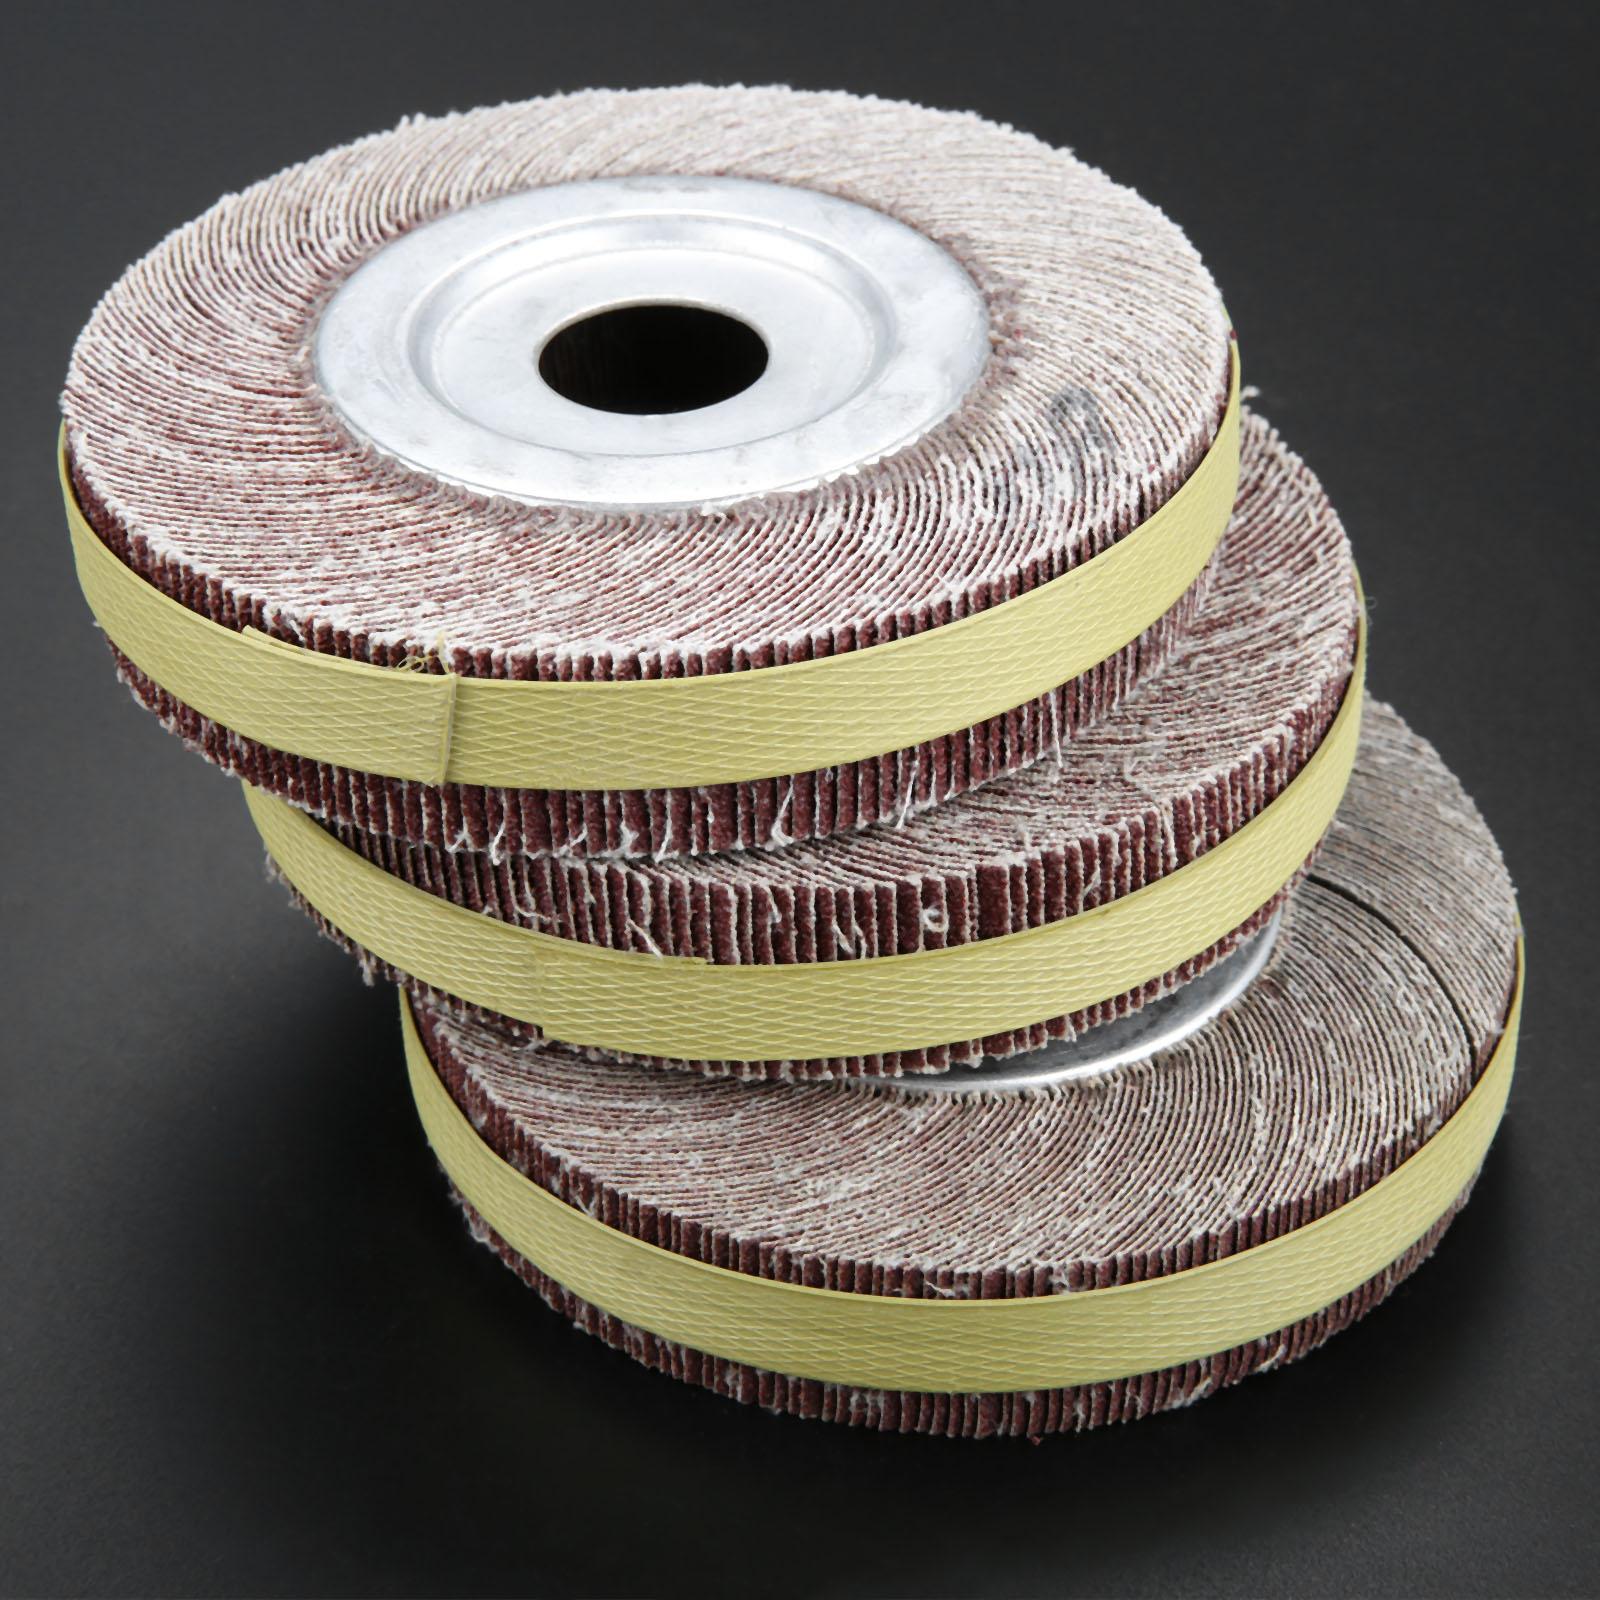 DIY Polishing Flap Sanding Disc Sand Paper Wheel 80~320 Grit Angle Grinding Tool